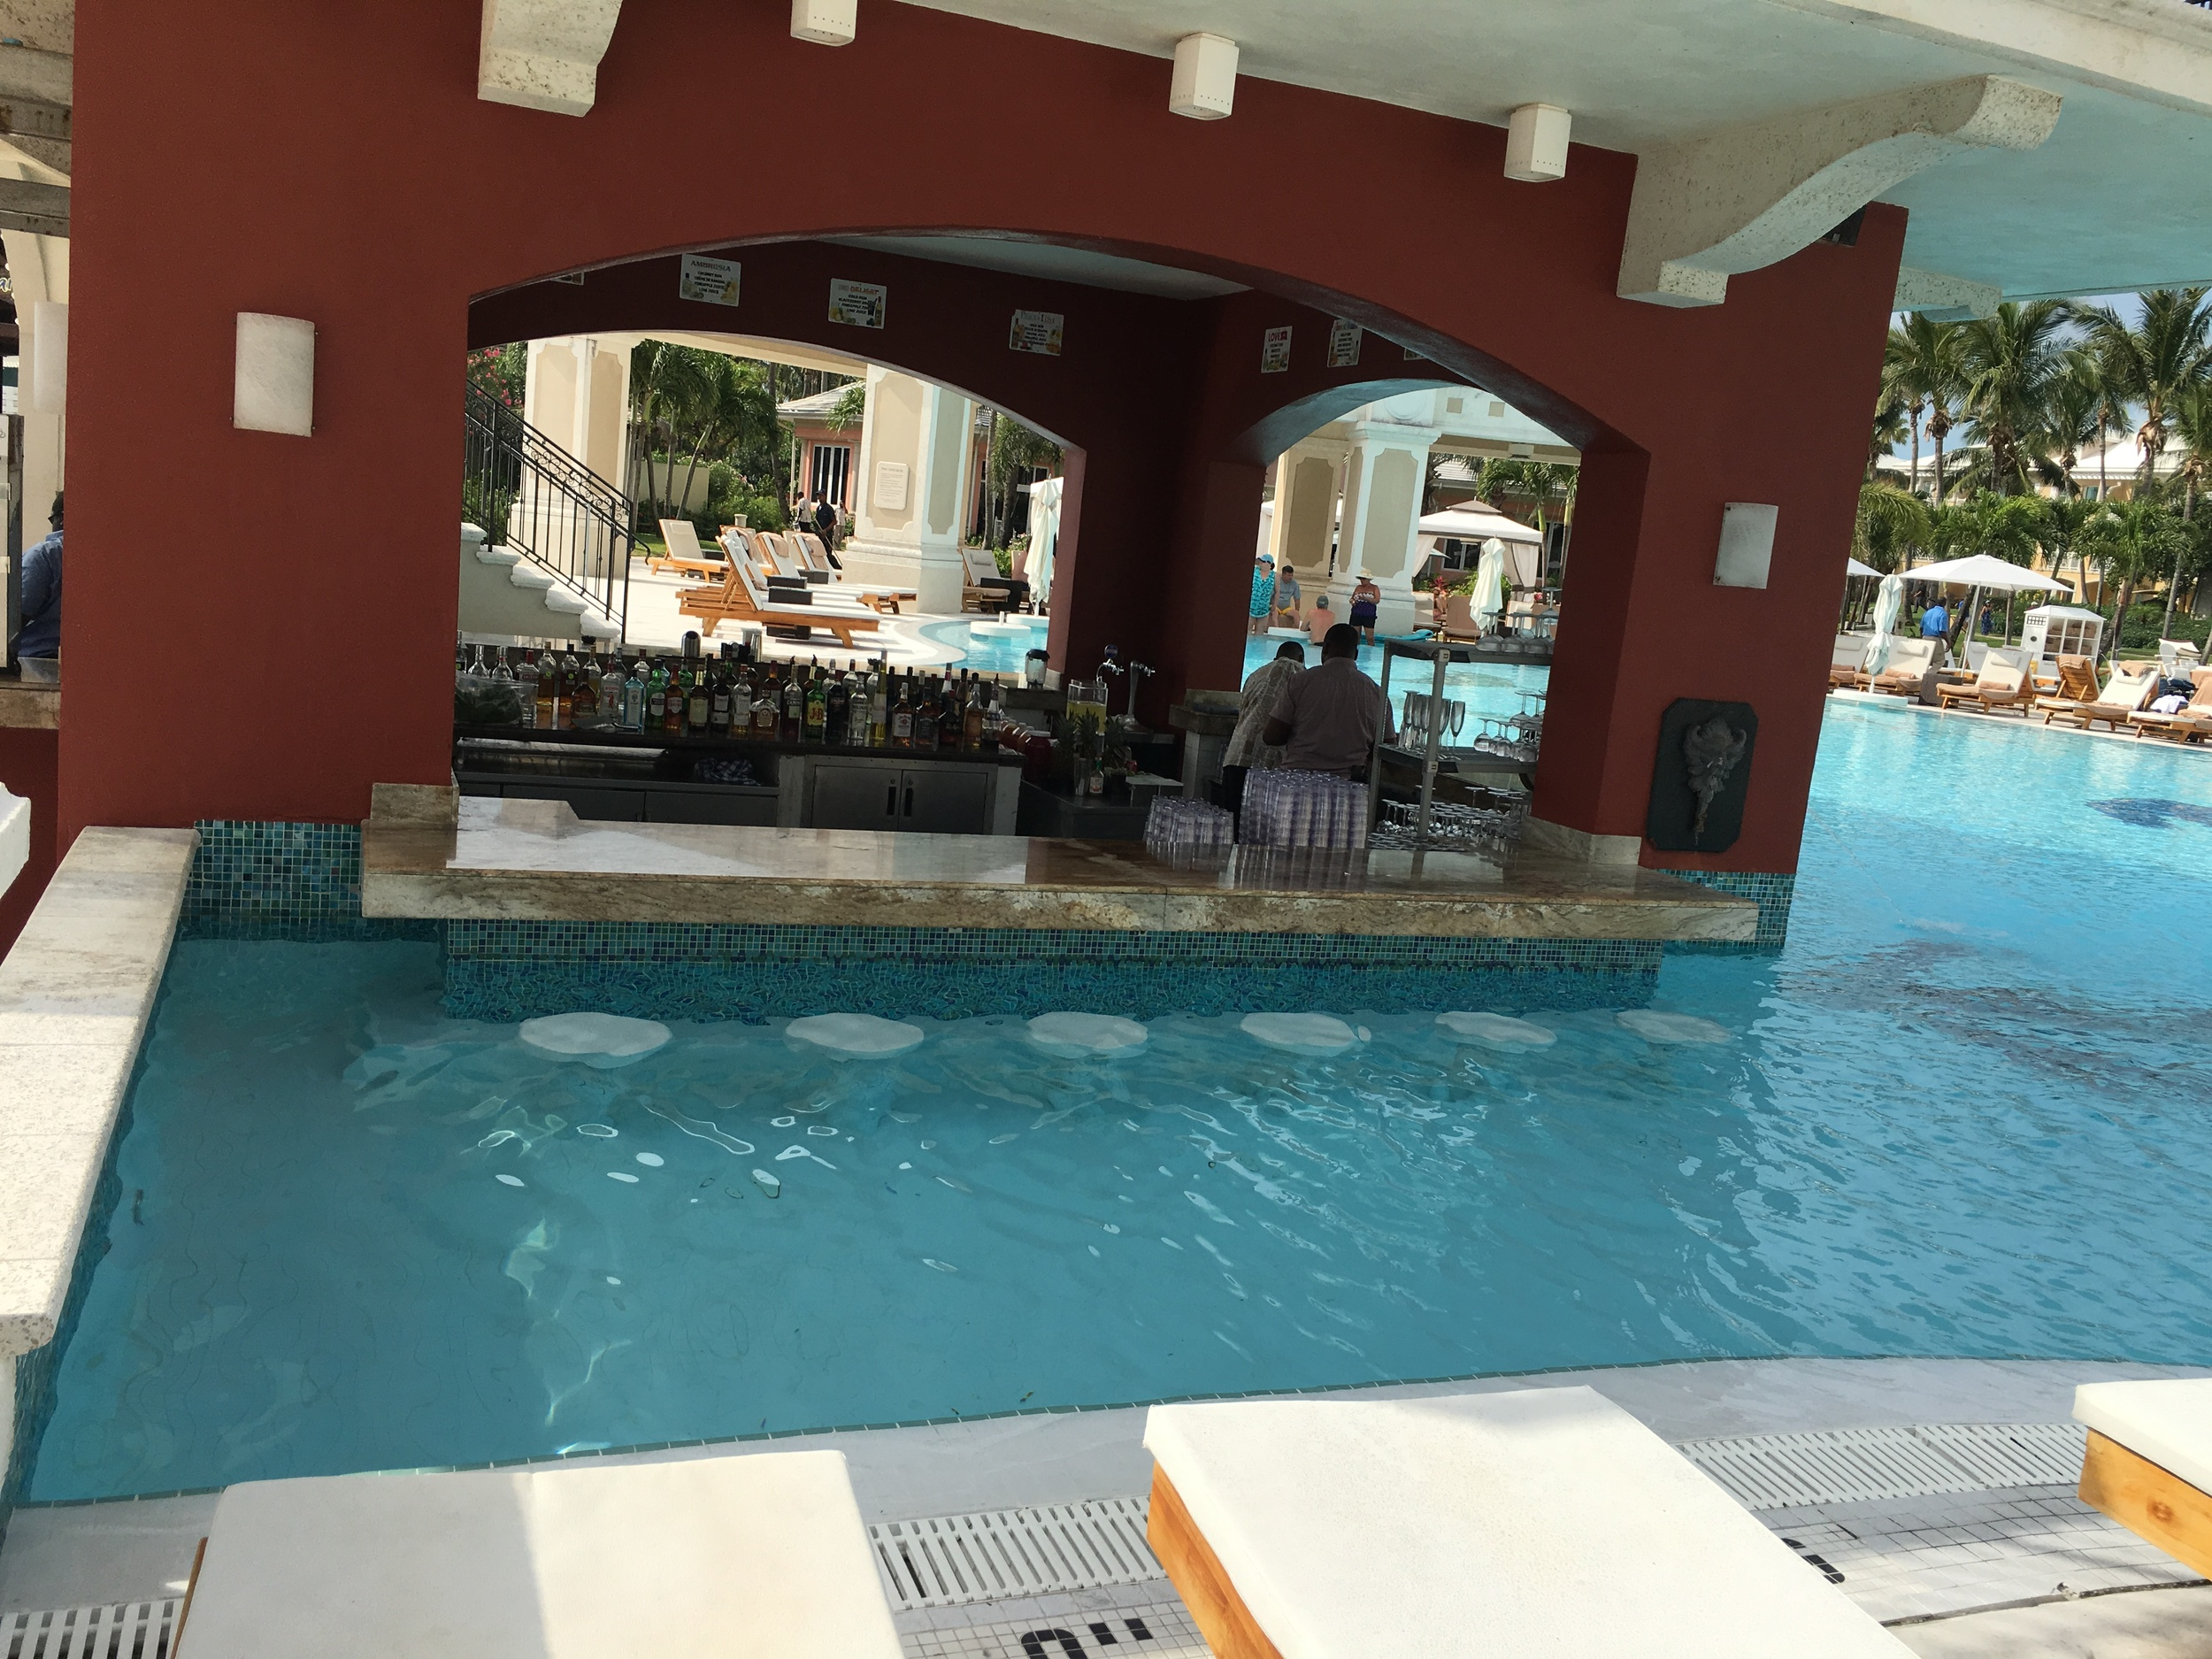 the Swim-up Bar